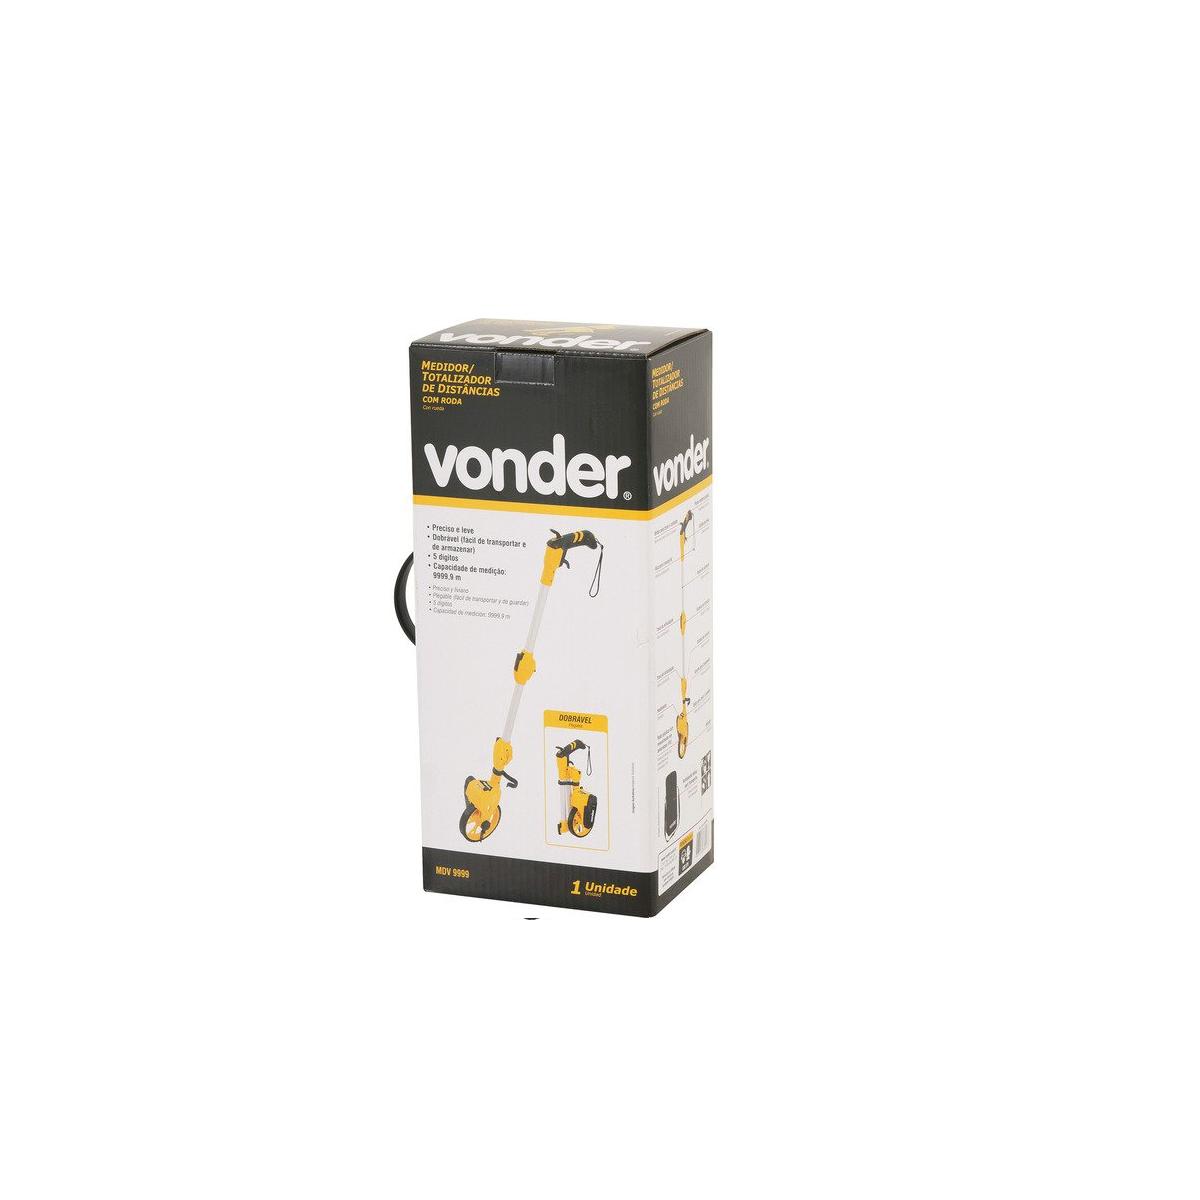 Medidor de distância com roda 5 dígitos VONDER